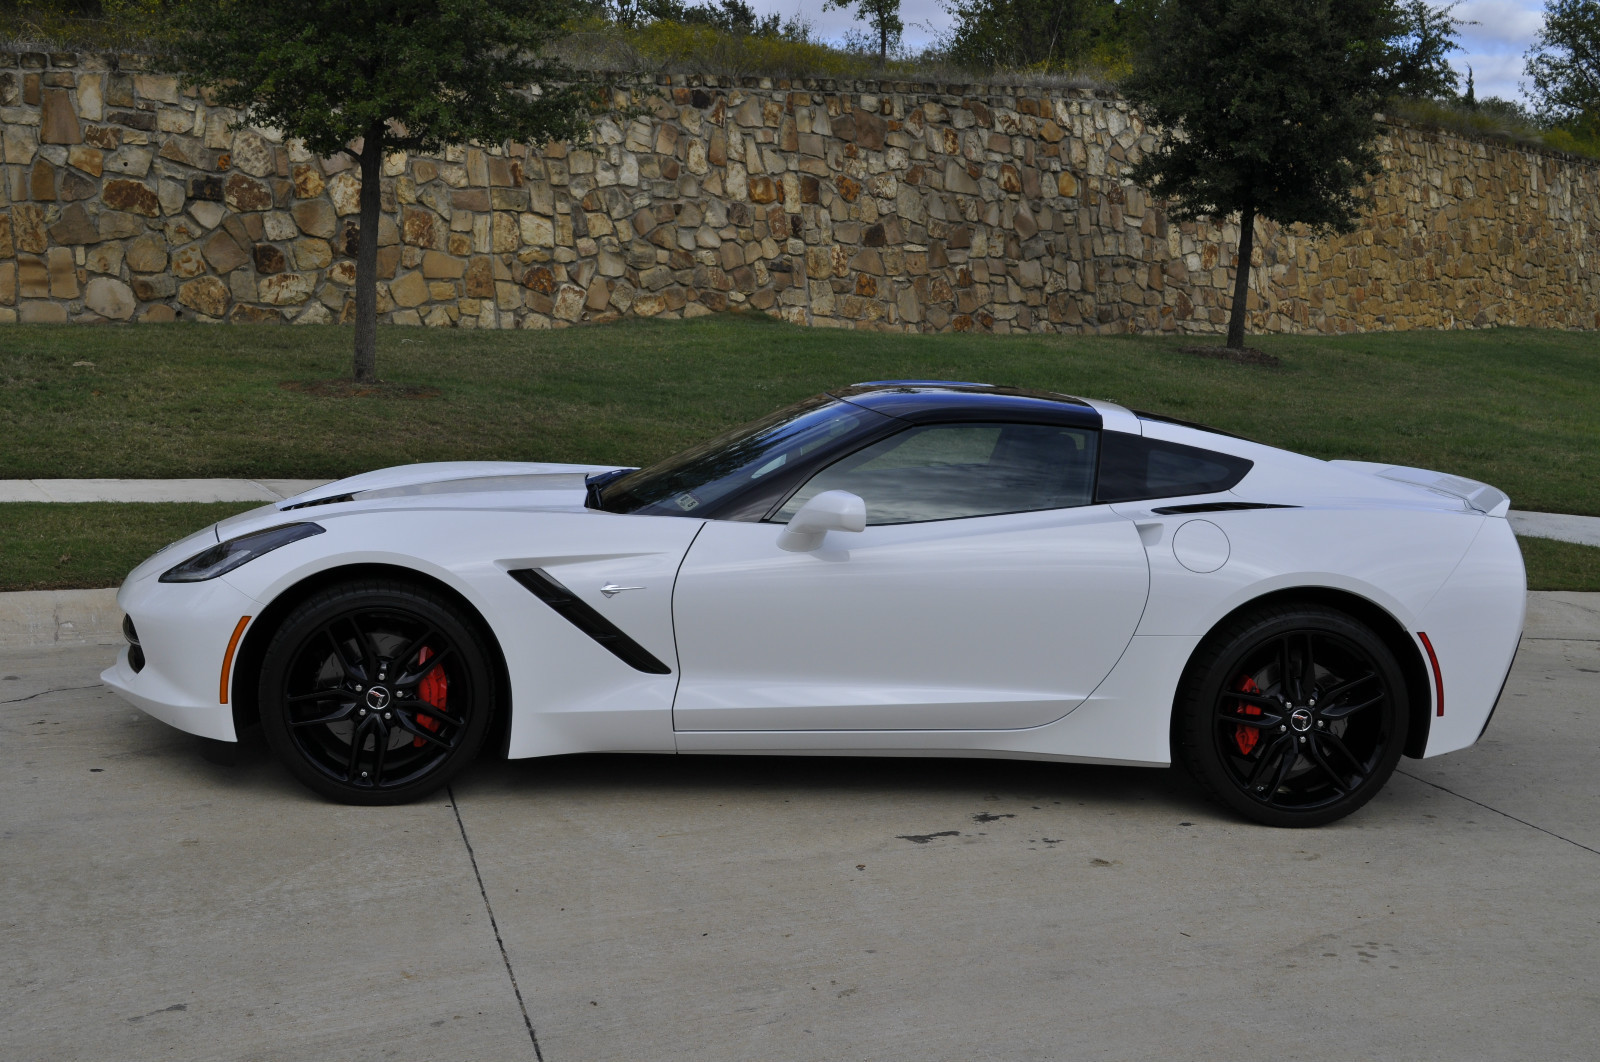 chevrolet corvette 2014 white. chevrolet corvette 2014 white